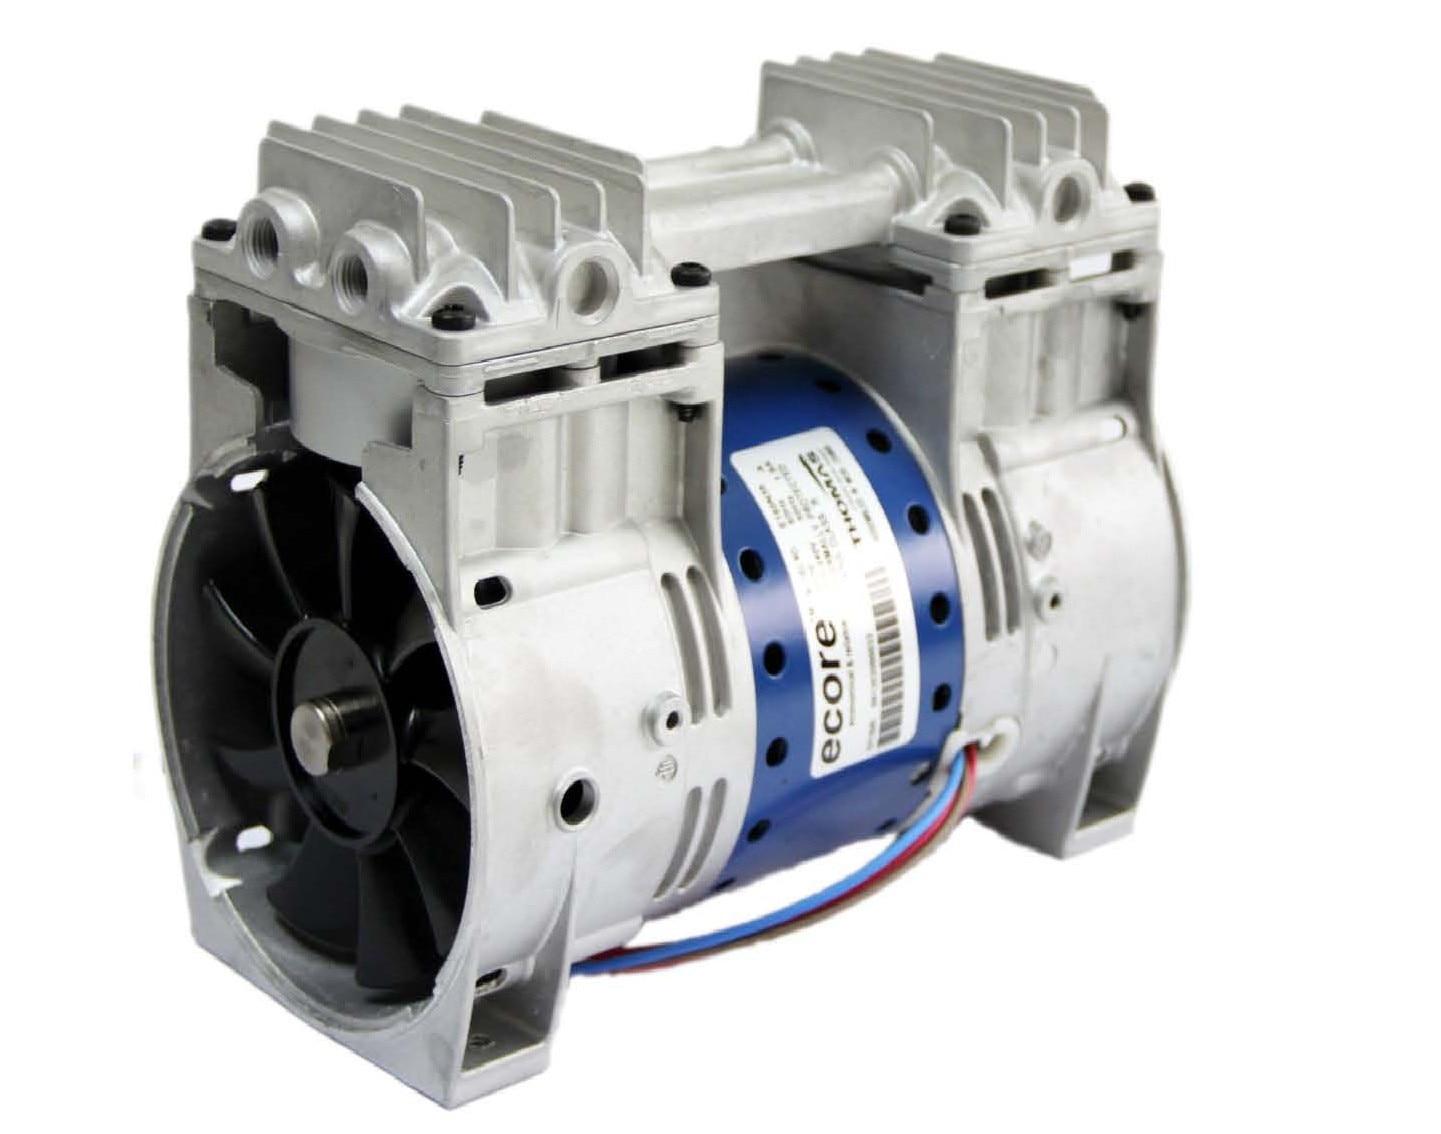 E160N42 cutting machine with built-in silent oil-free vacuum pump